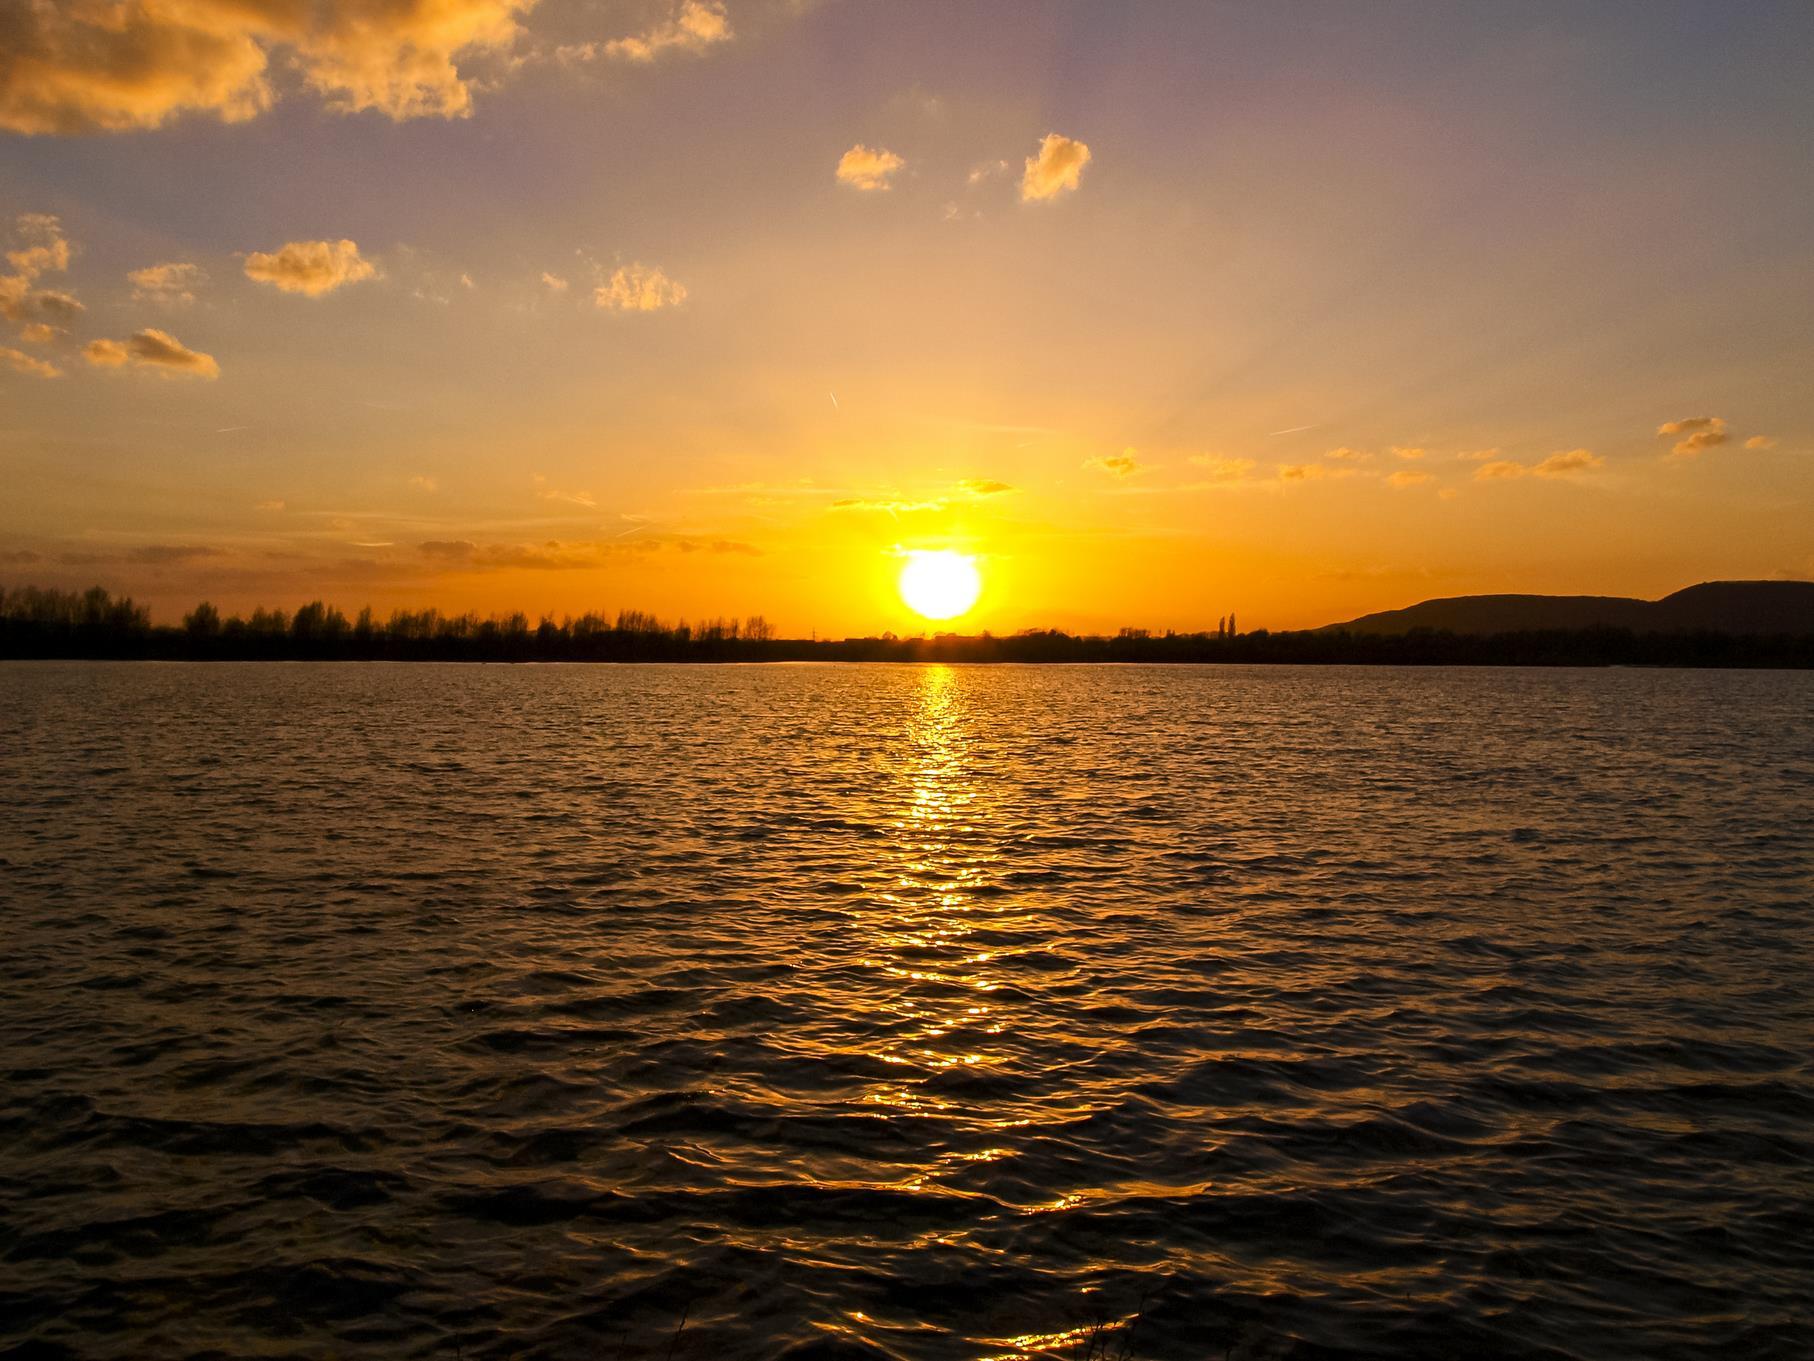 Sonnenuntergang am mittleren Teich.